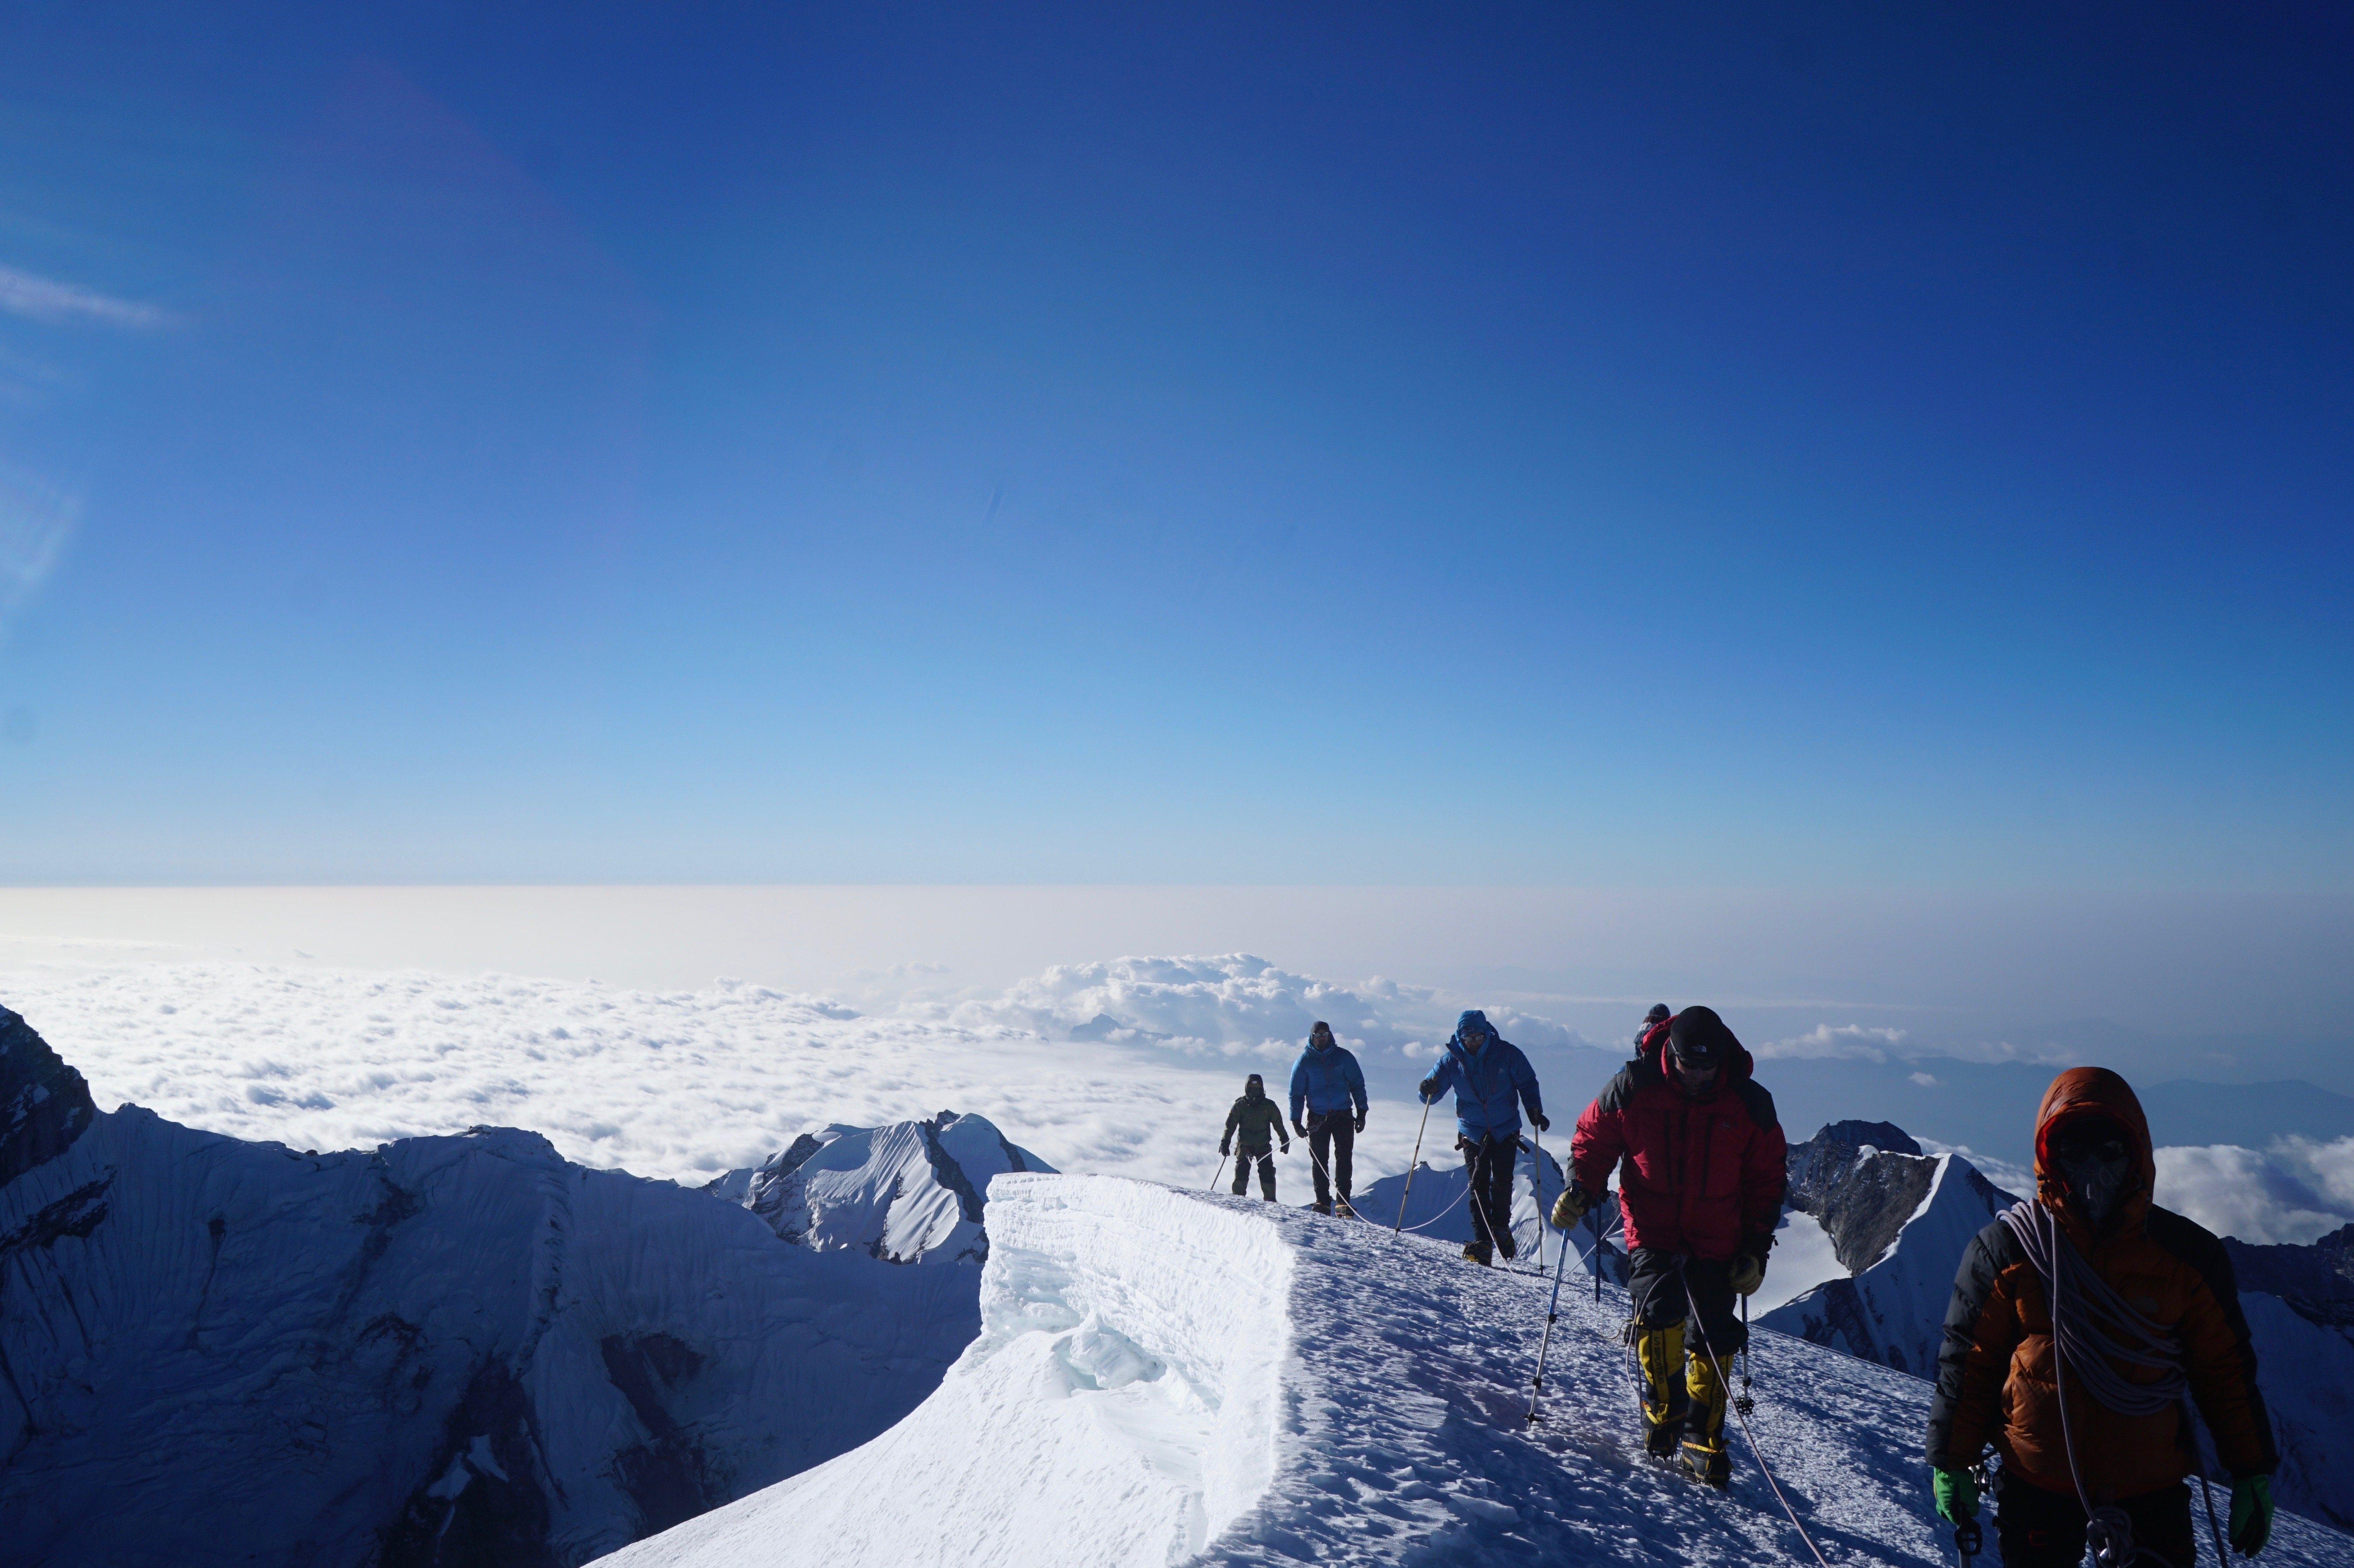 Members of the Mission Himalaya team approaching the summit of Mera Peak